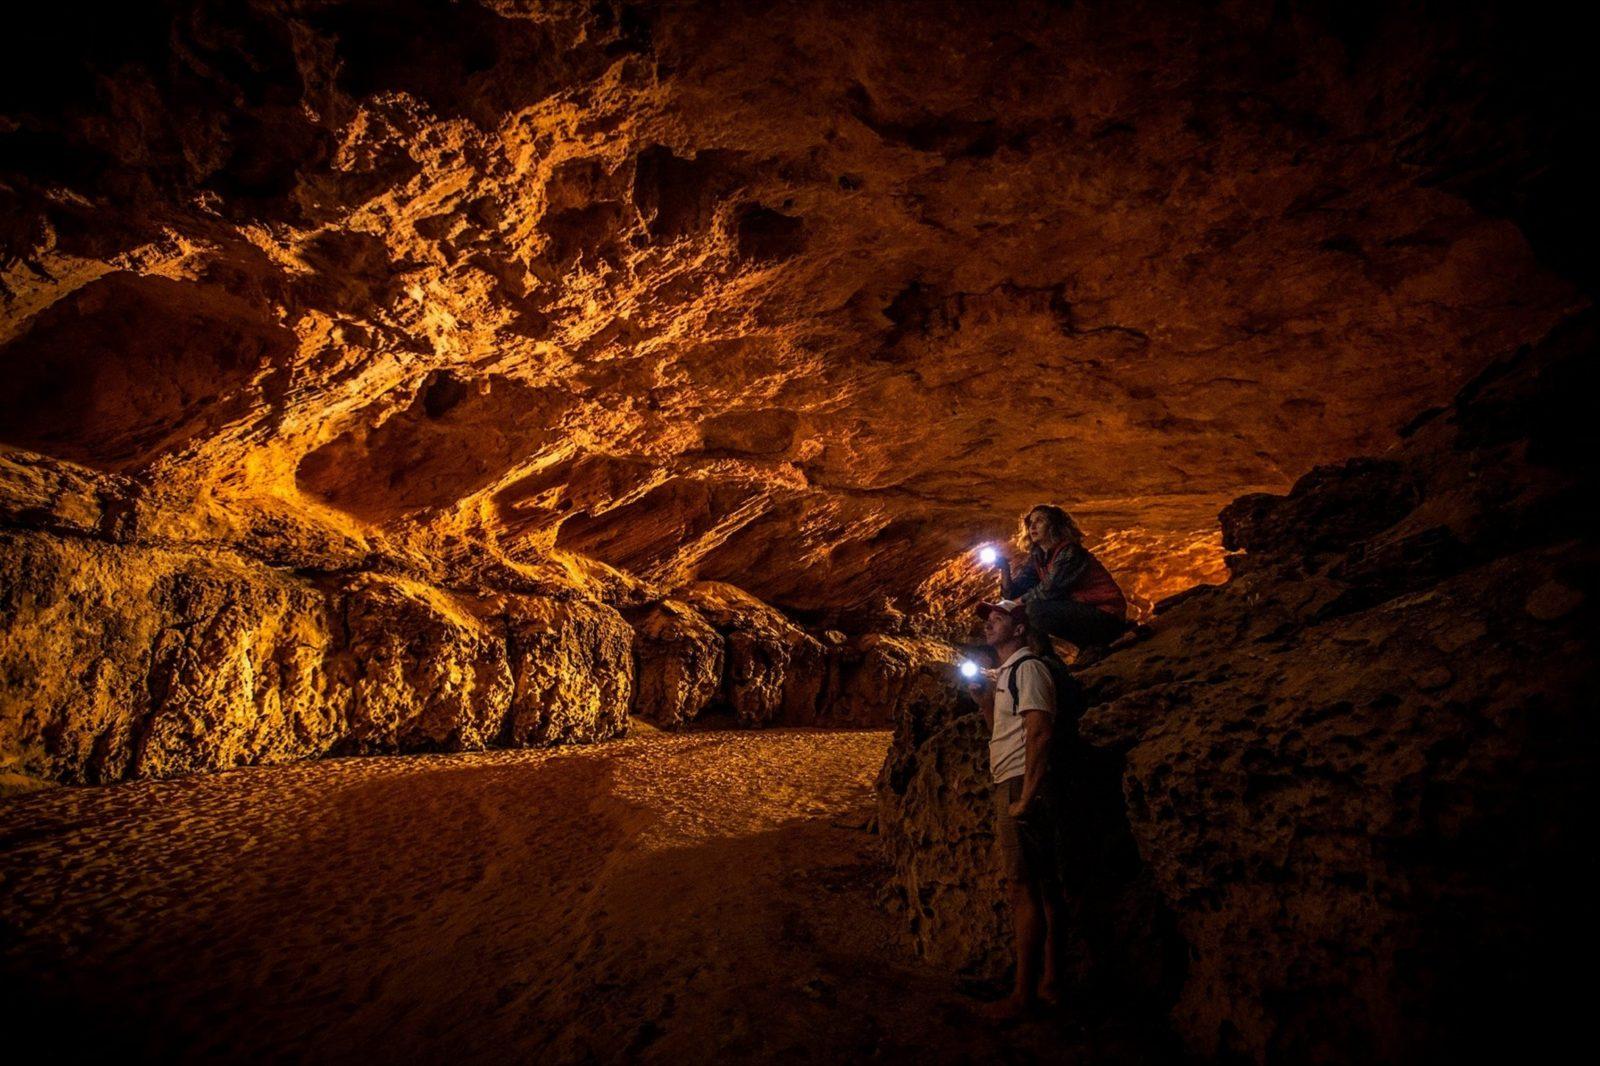 Stockyard Gully Cave, Leeman, Western Australia